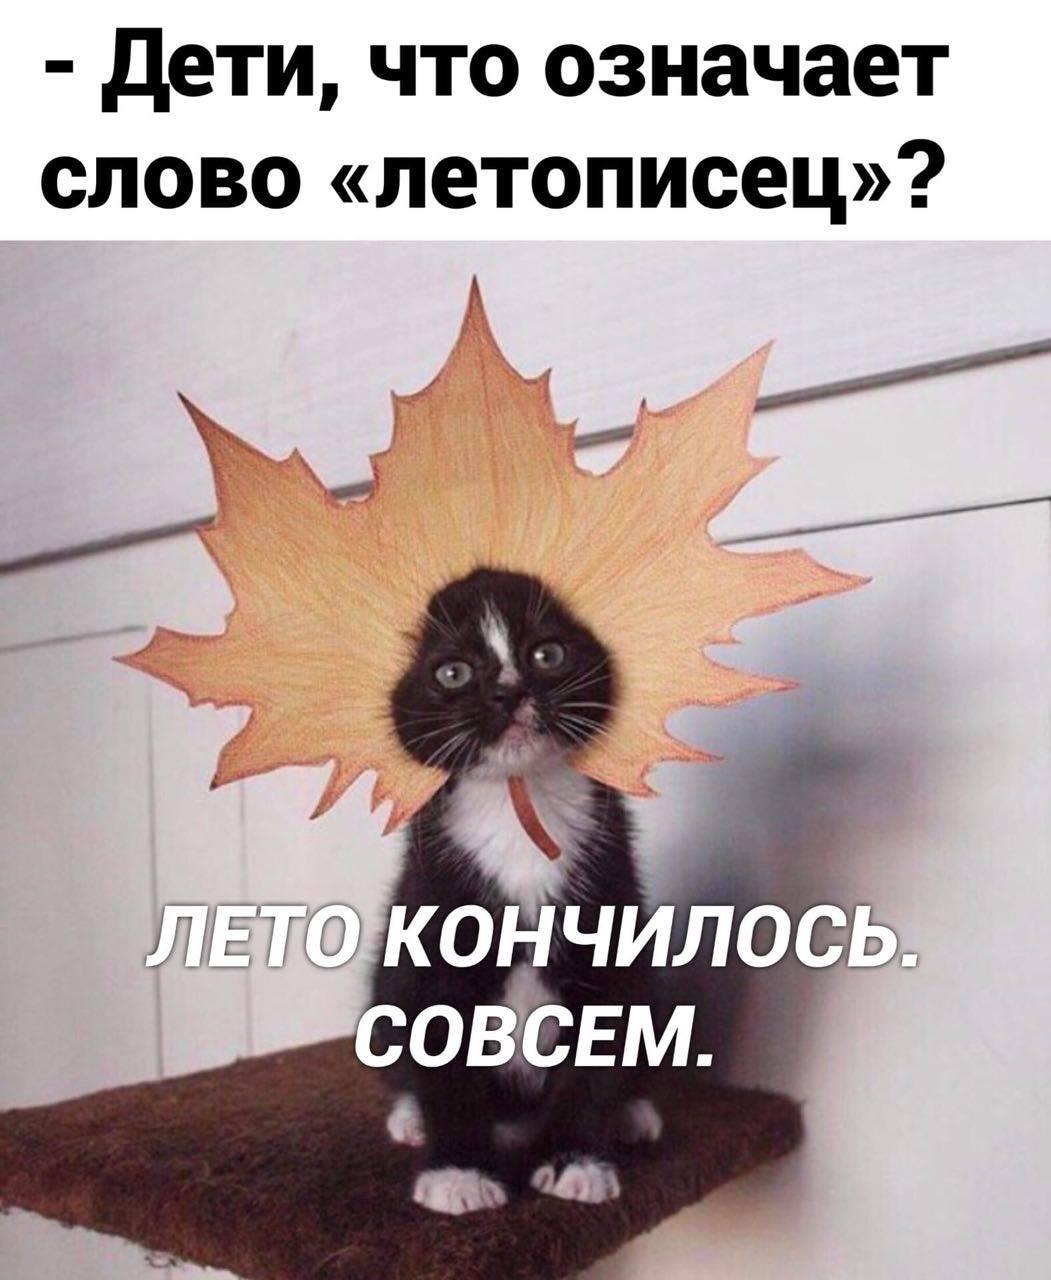 https://ic.pics.livejournal.com/tiina/12725143/26009396/26009396_original.jpg